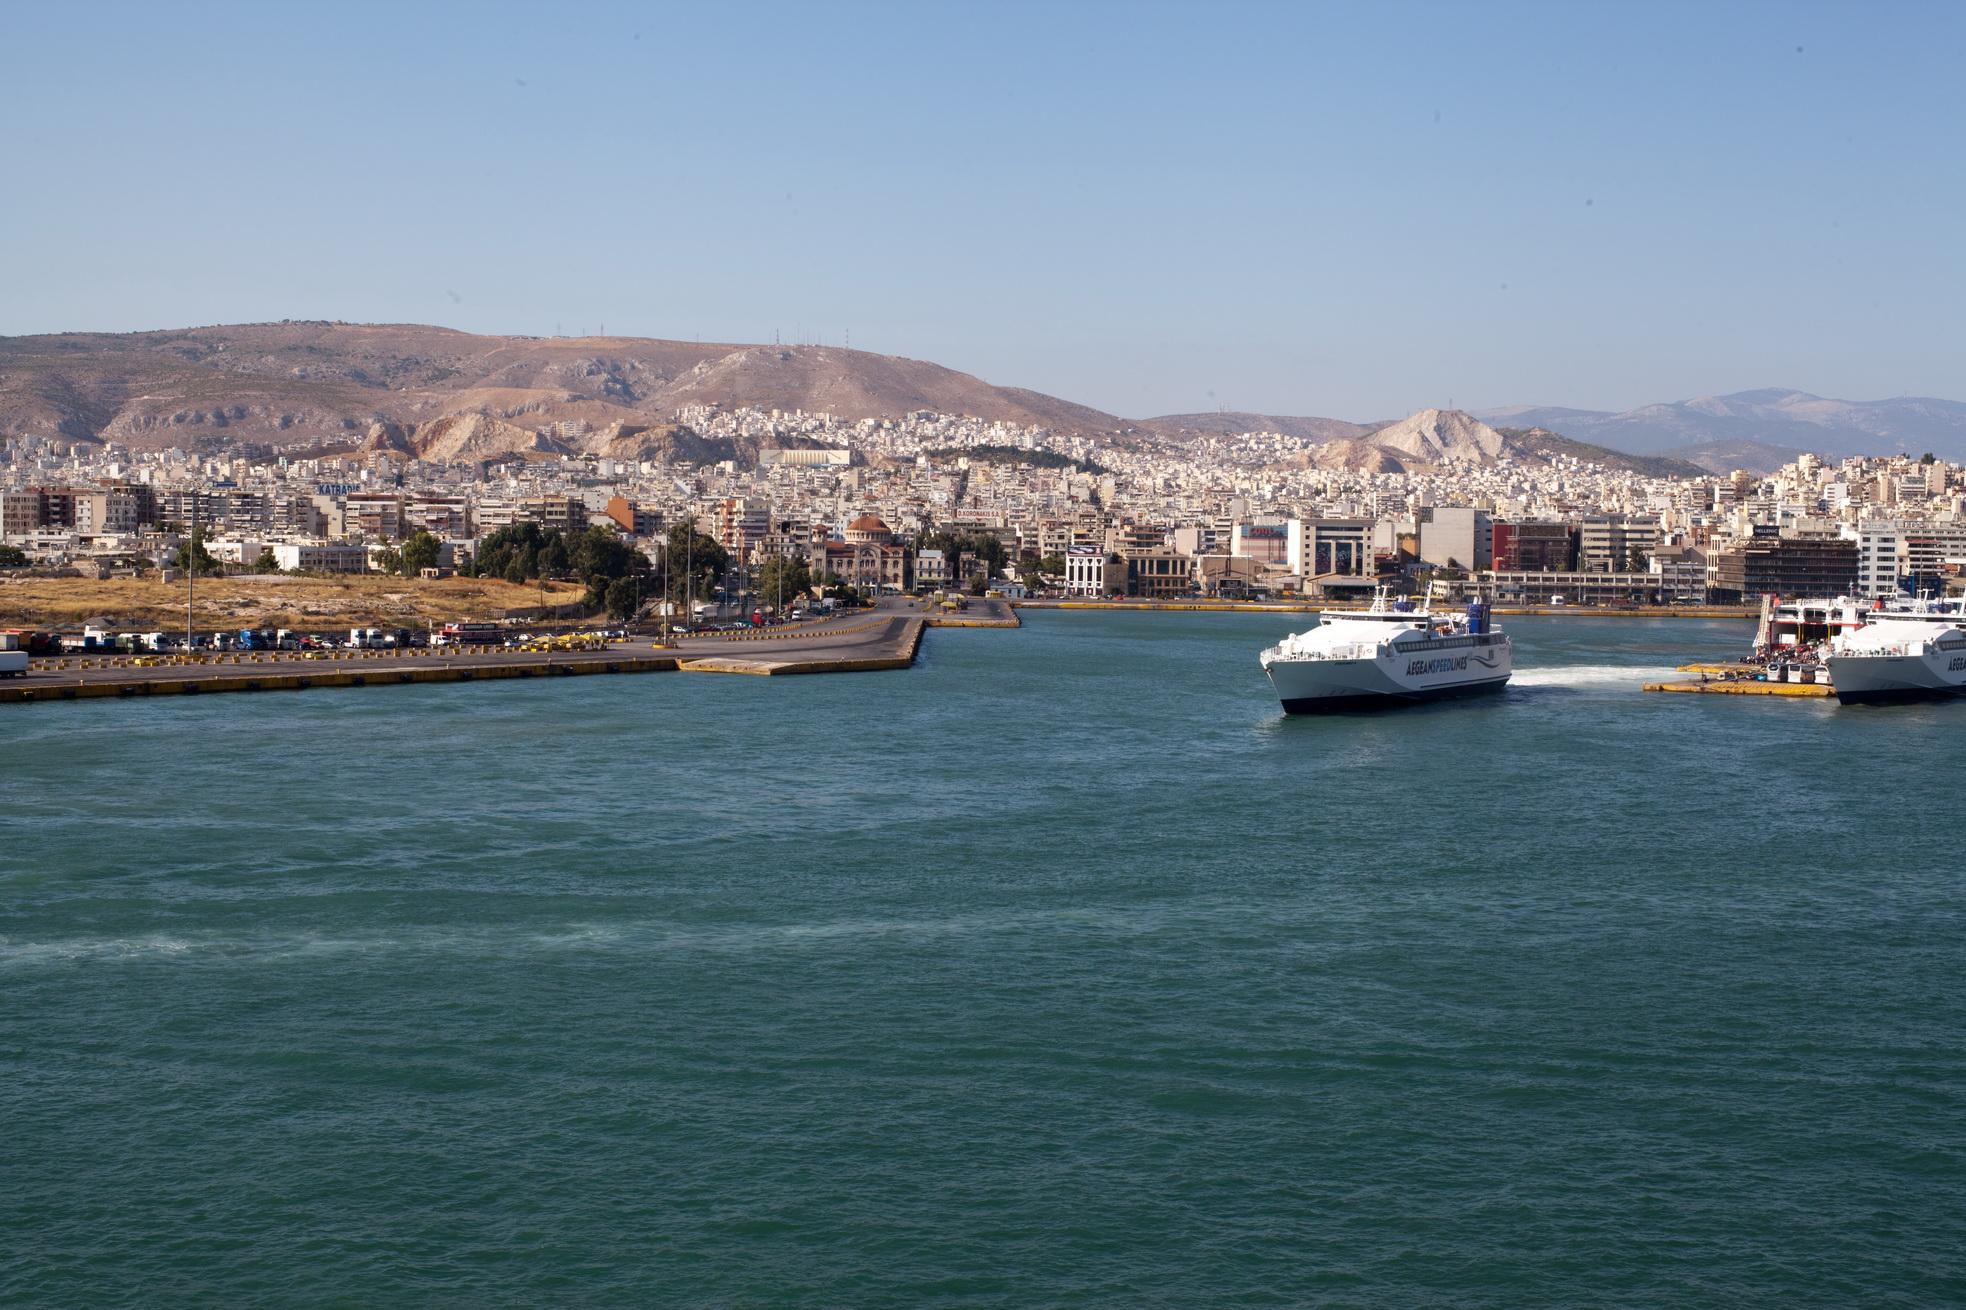 MS Speedrunner IV IMO 9141883 Aegean Speed Lines leaving Piraeus Port of Athens Greece 01